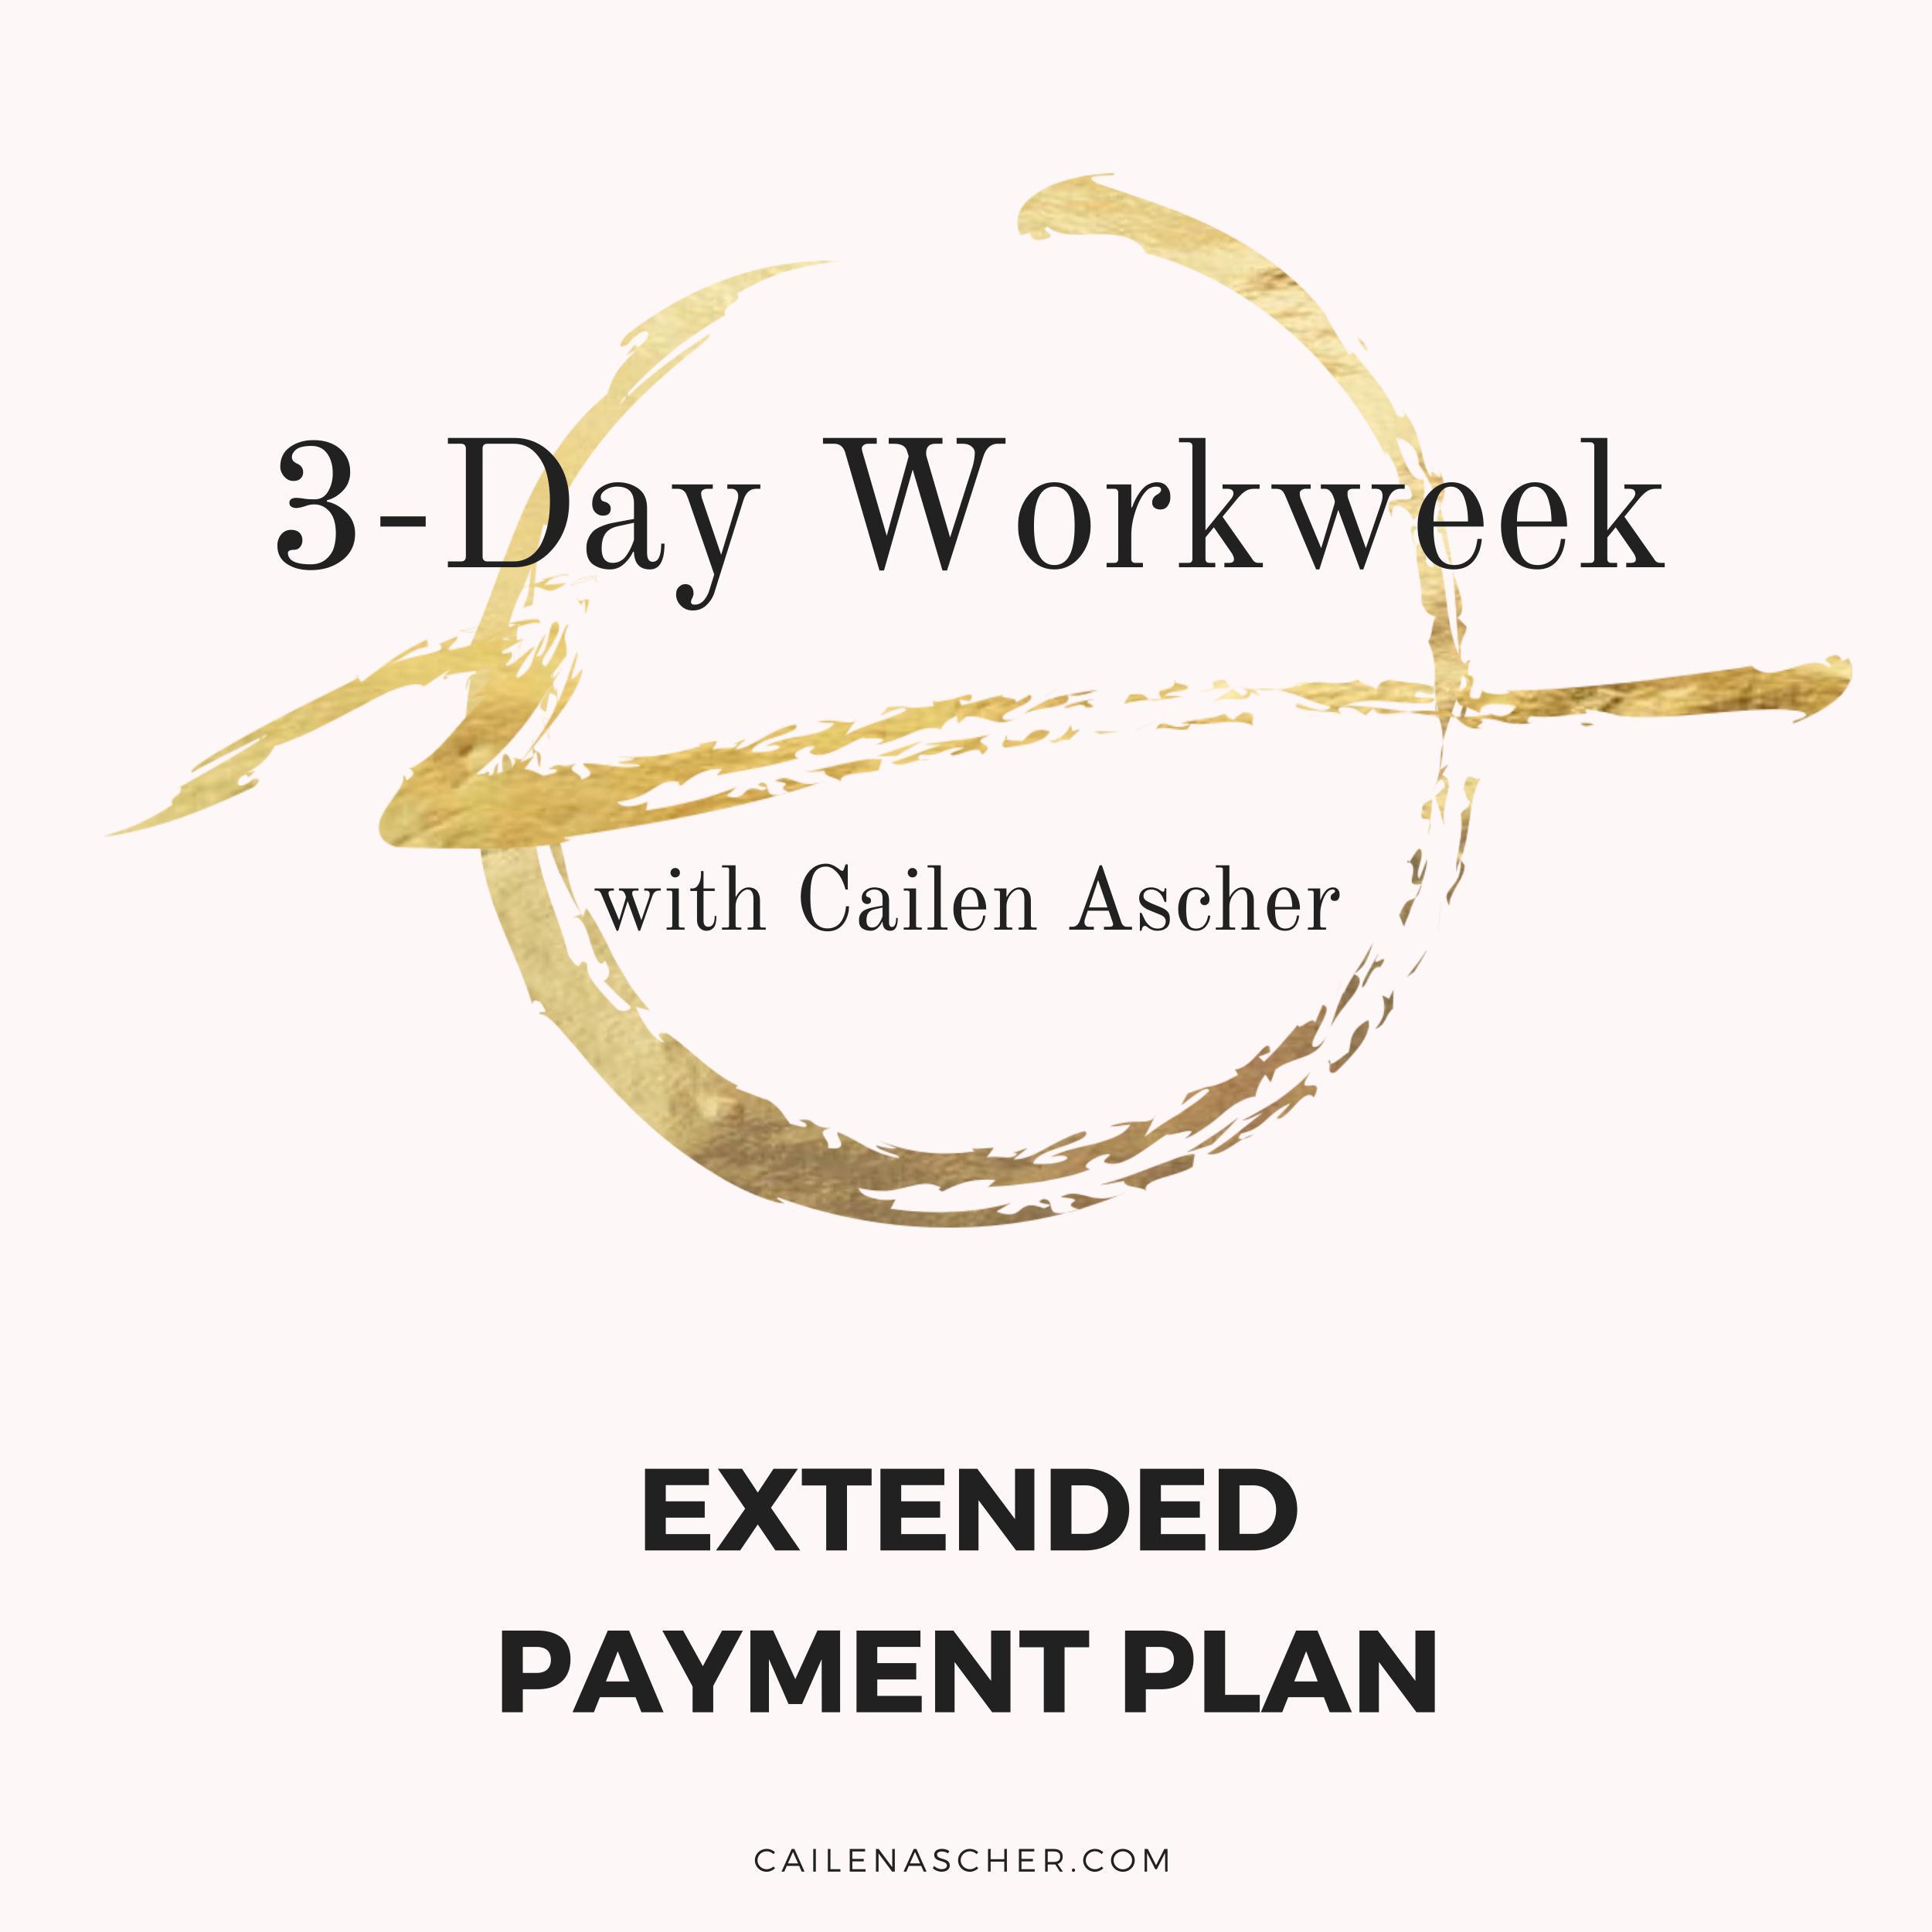 Cailen Ascher - 3-Day Workweek Program - Payment Plan Option Image - LIVE Track EXTENDED Payment Plan.jpg